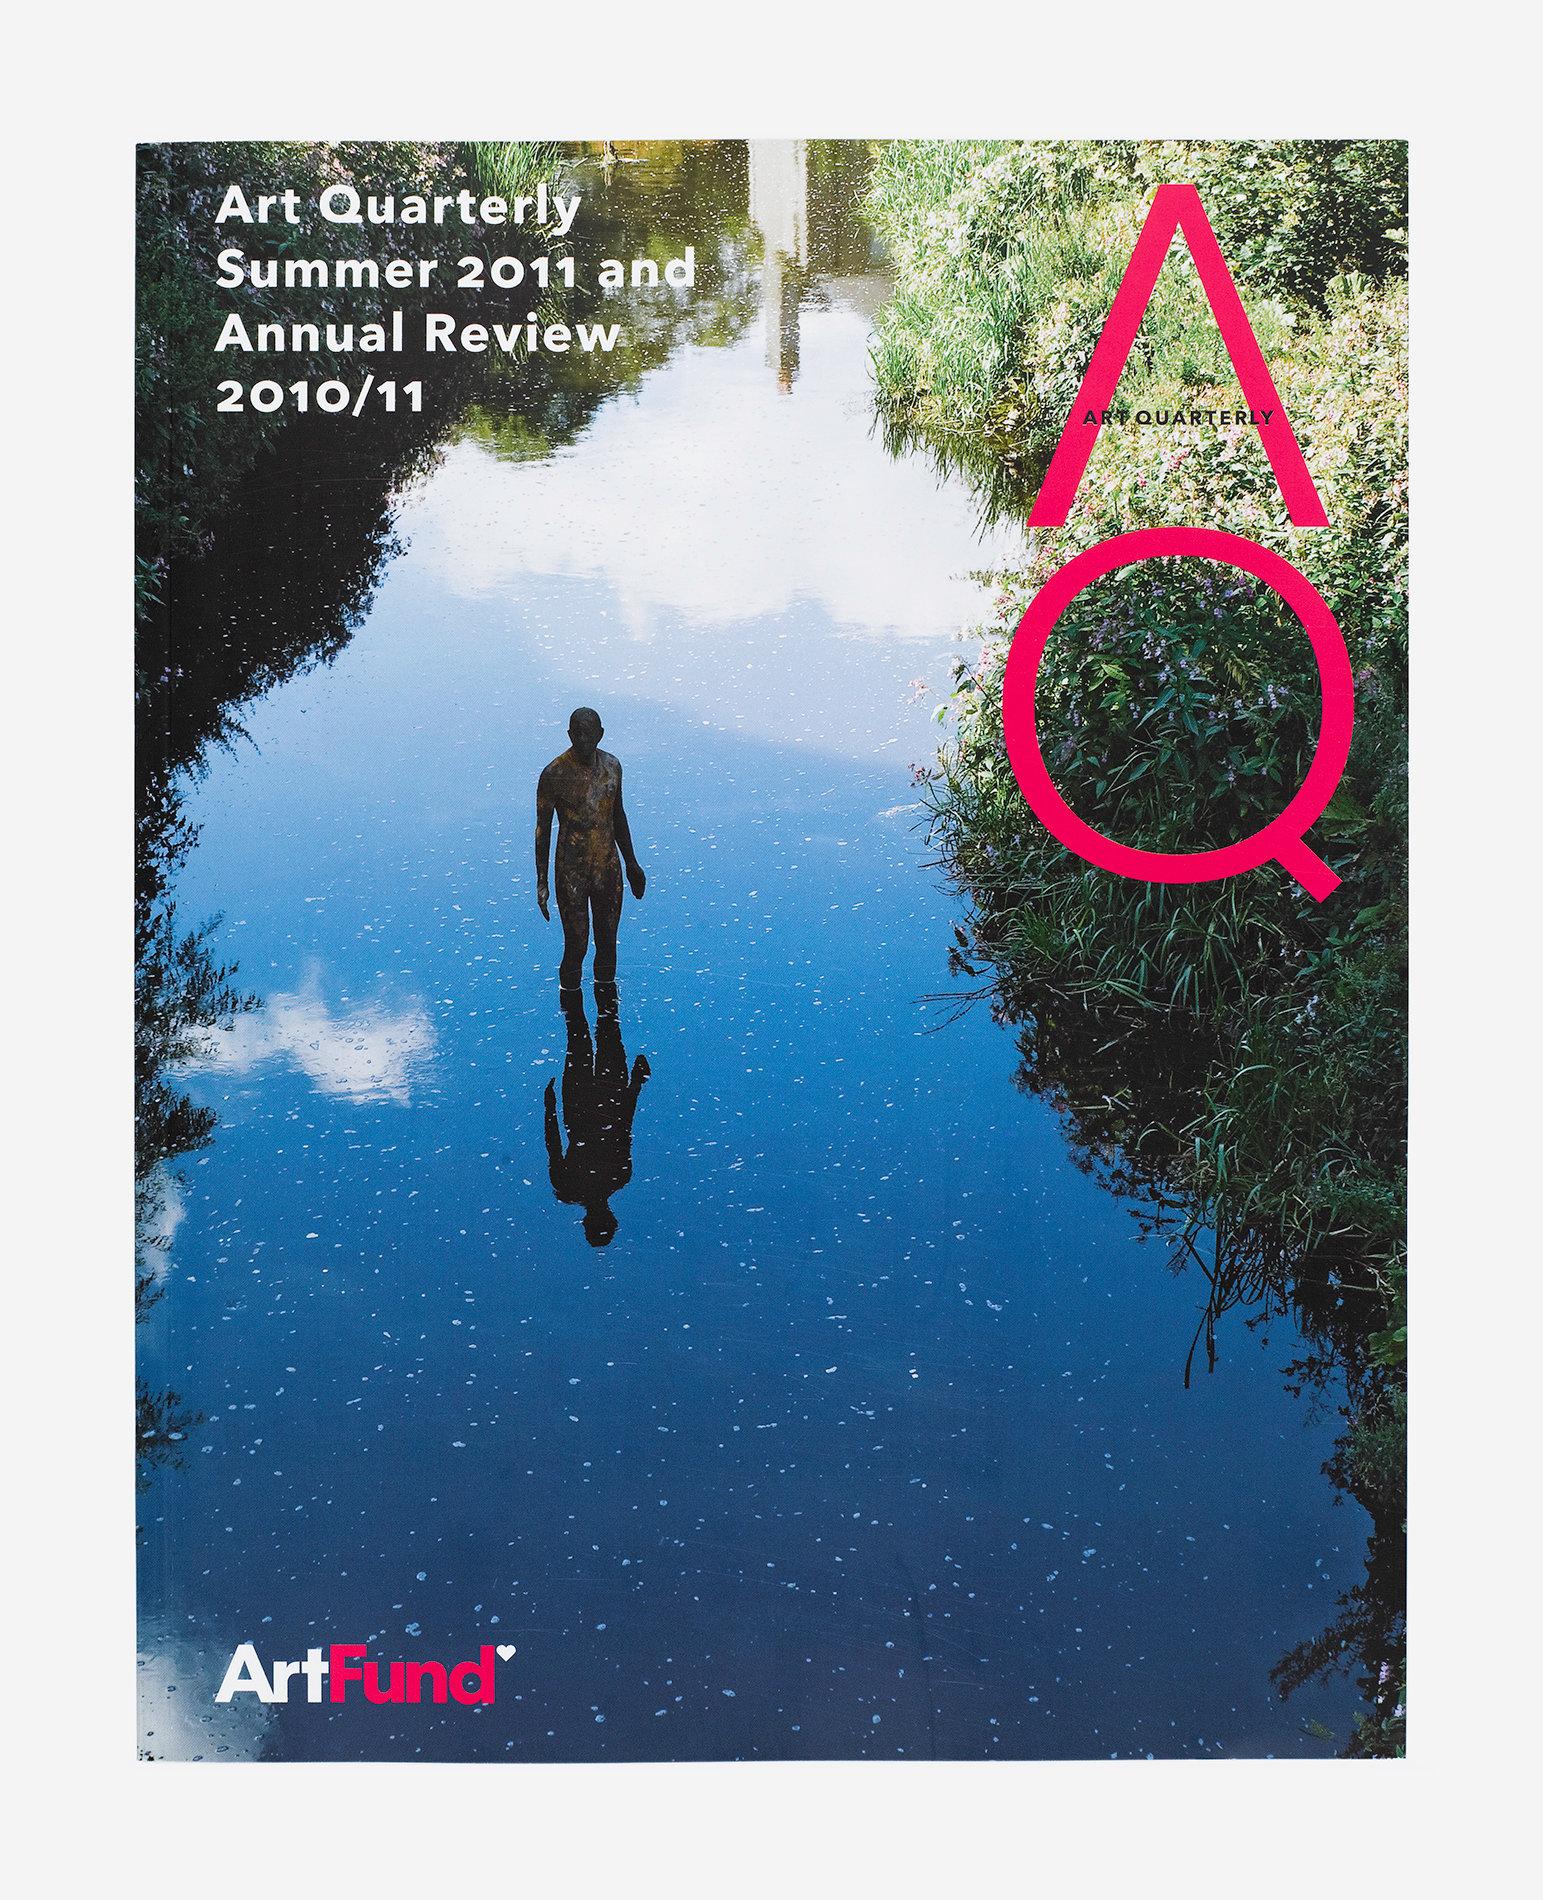 Art Quarterly Annual Review 2010/11